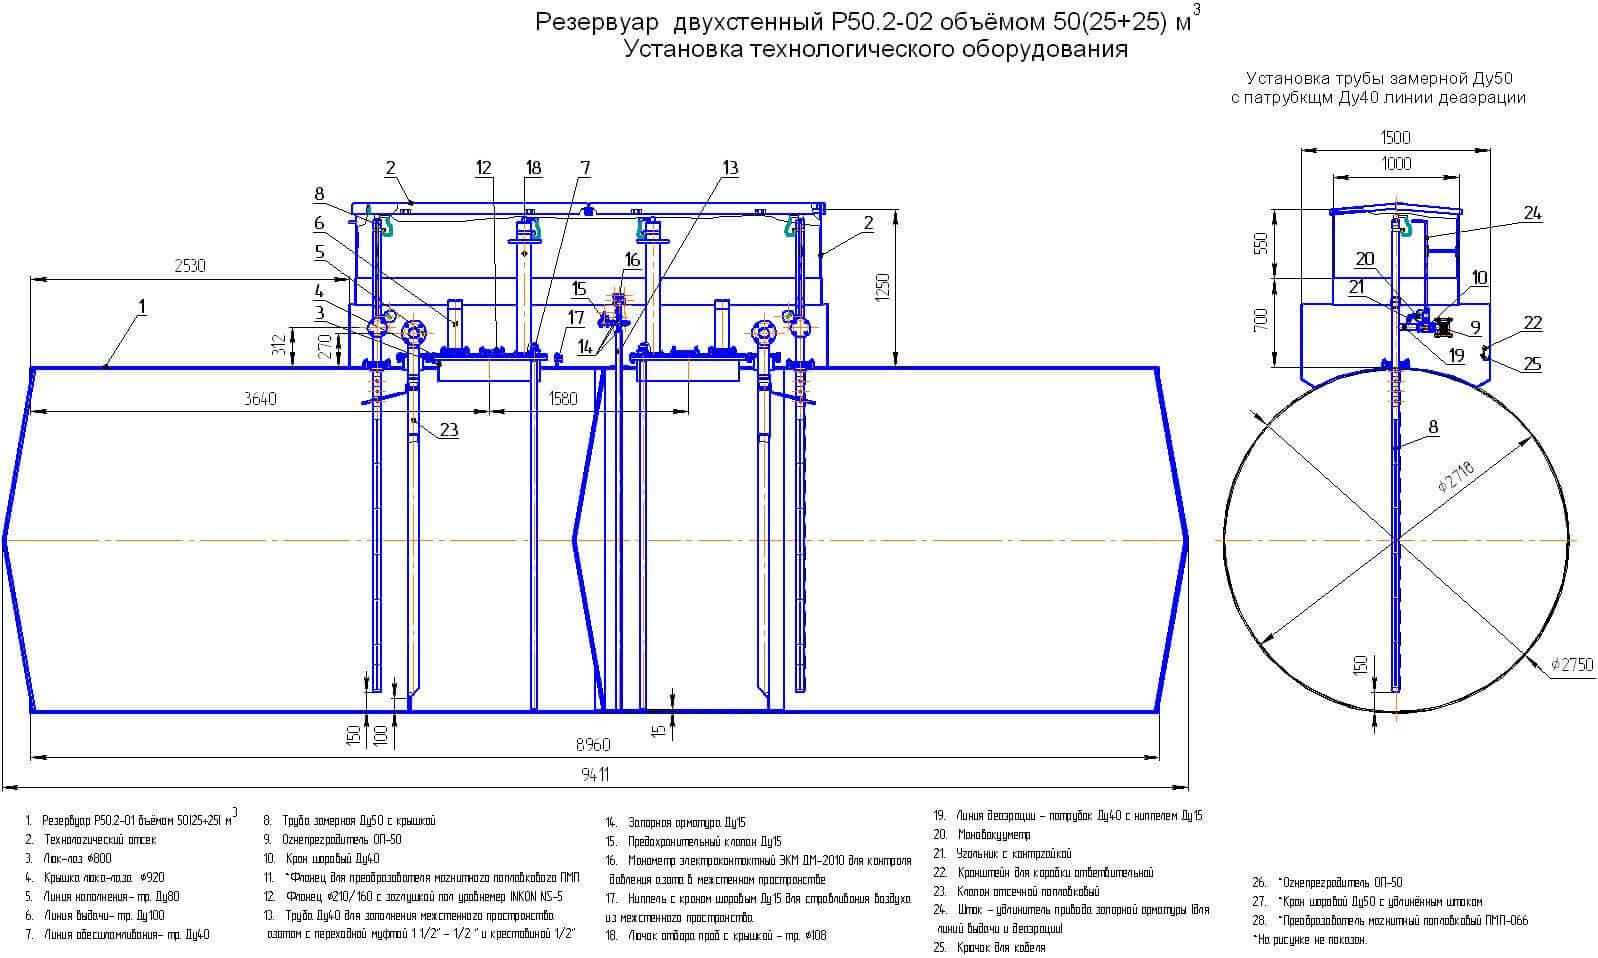 rezervuary i emkosti cilindricheskie rvs rgs 6 2 Резервуары и емкости цилиндрические (РВС , РГС)